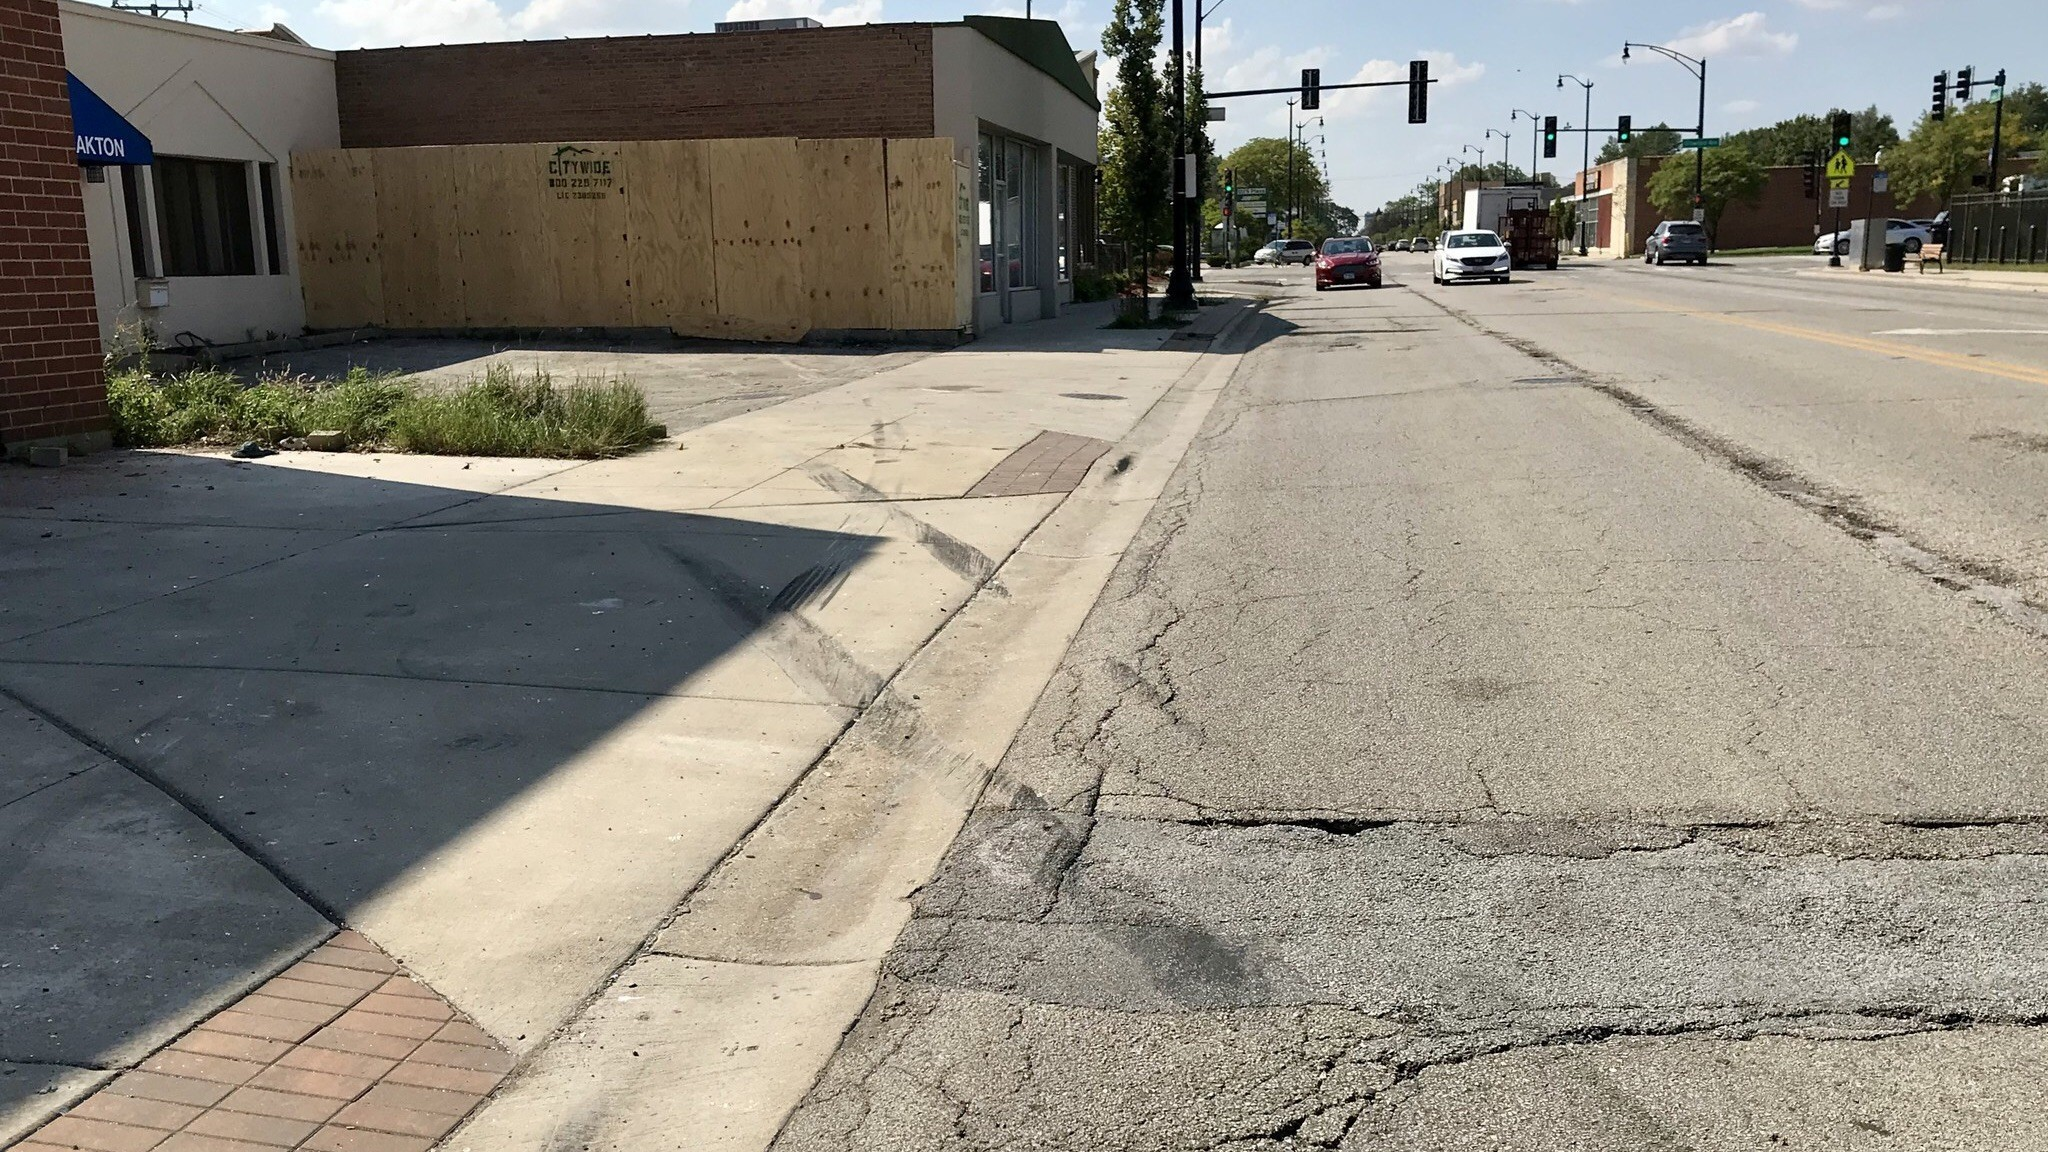 Corvette crashes into vacant Skokie building leaving driver hospitalized: Police | Chicago Tribune